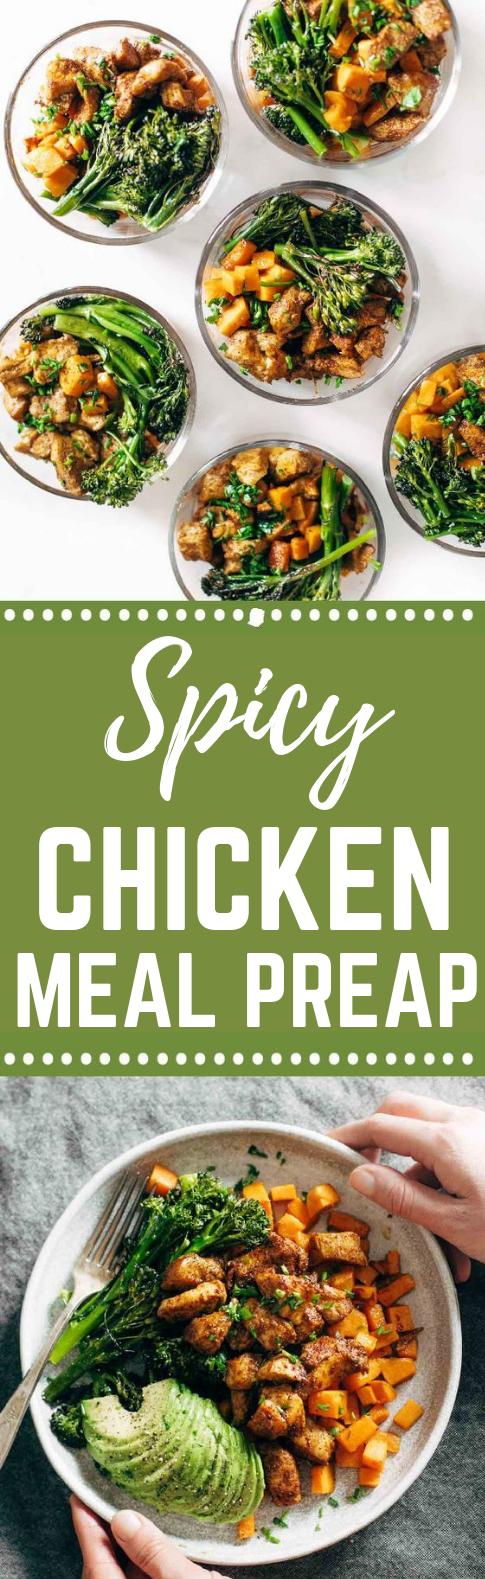 Spicy Chicken Sweet Potato Meal Prep Magic Bowls #HealthyRecipe #HealthyMeals